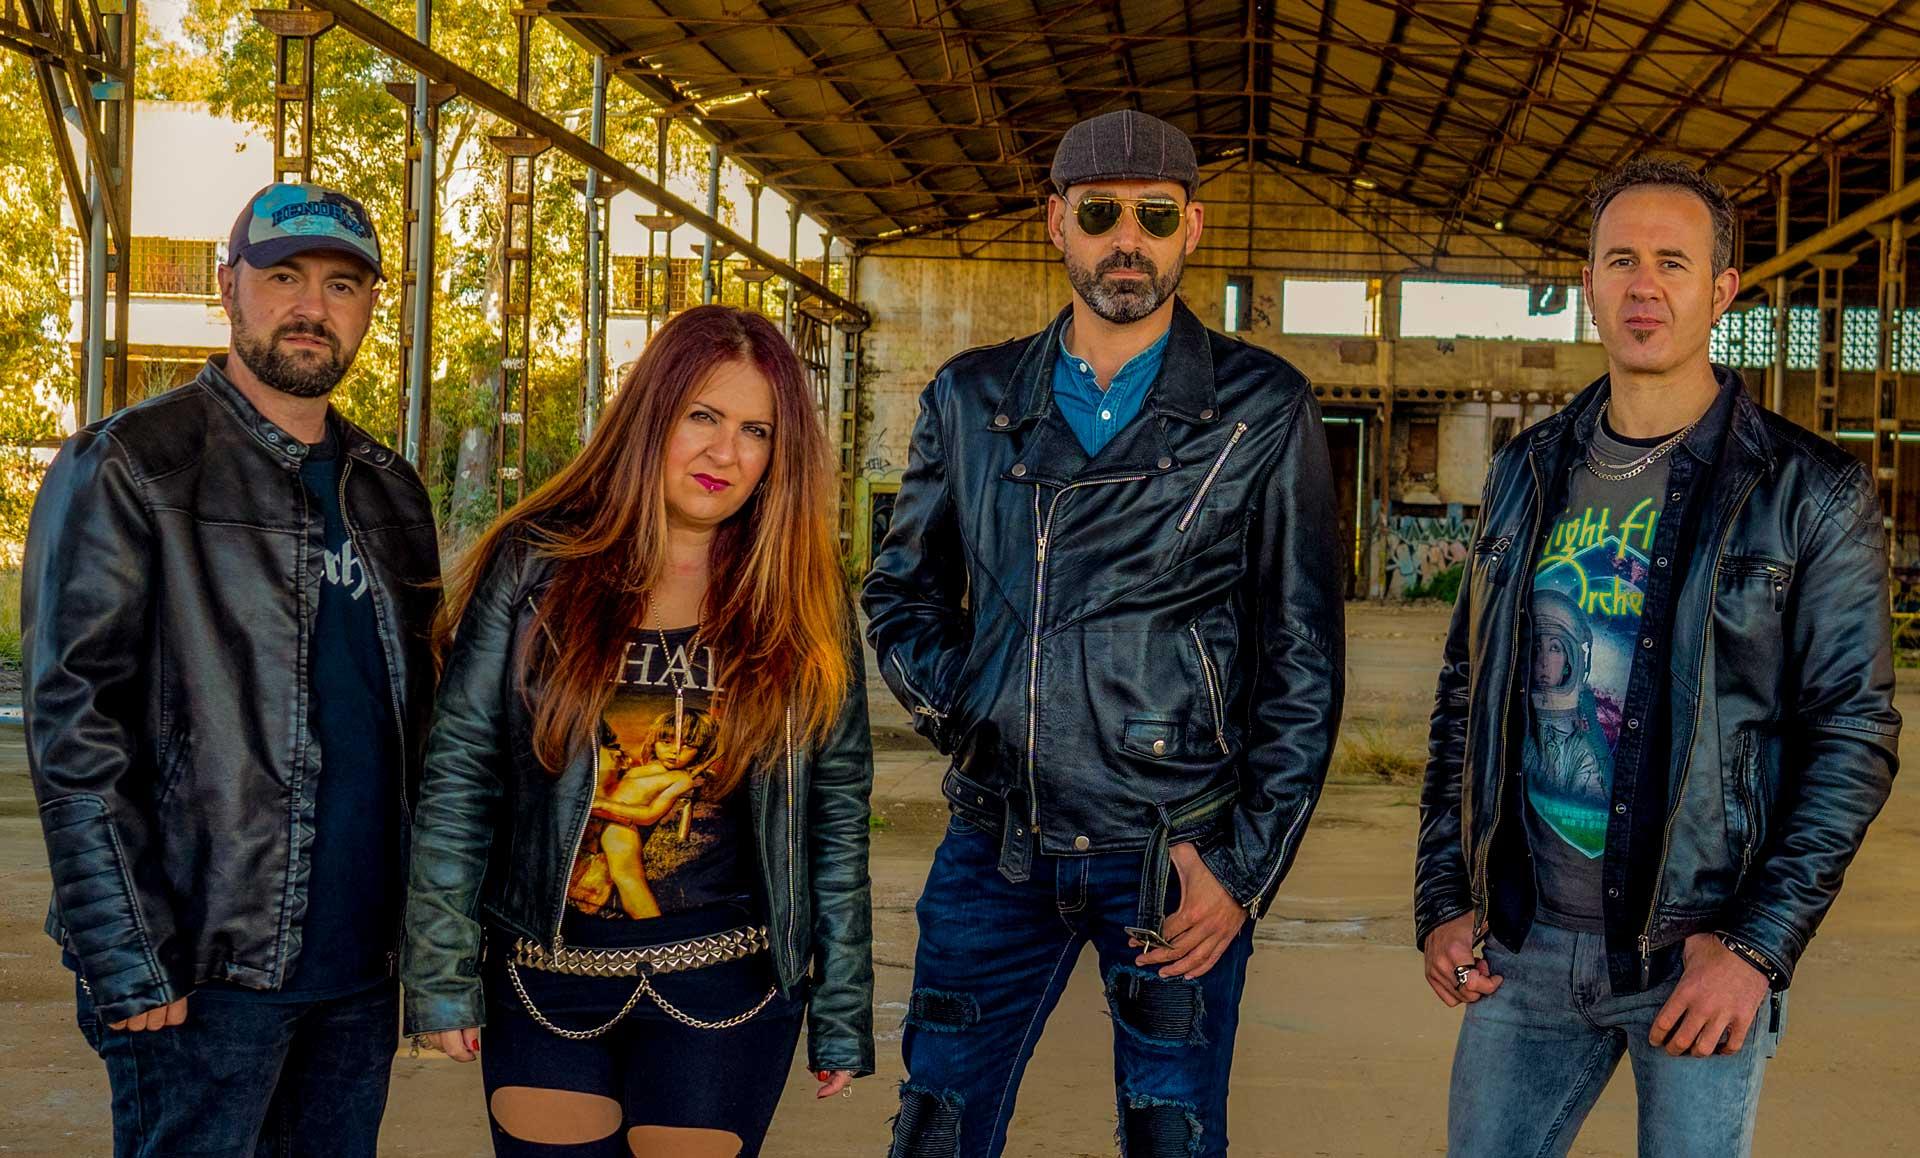 4-BAJO-ZERO-GRUPO-hard-rock-musica